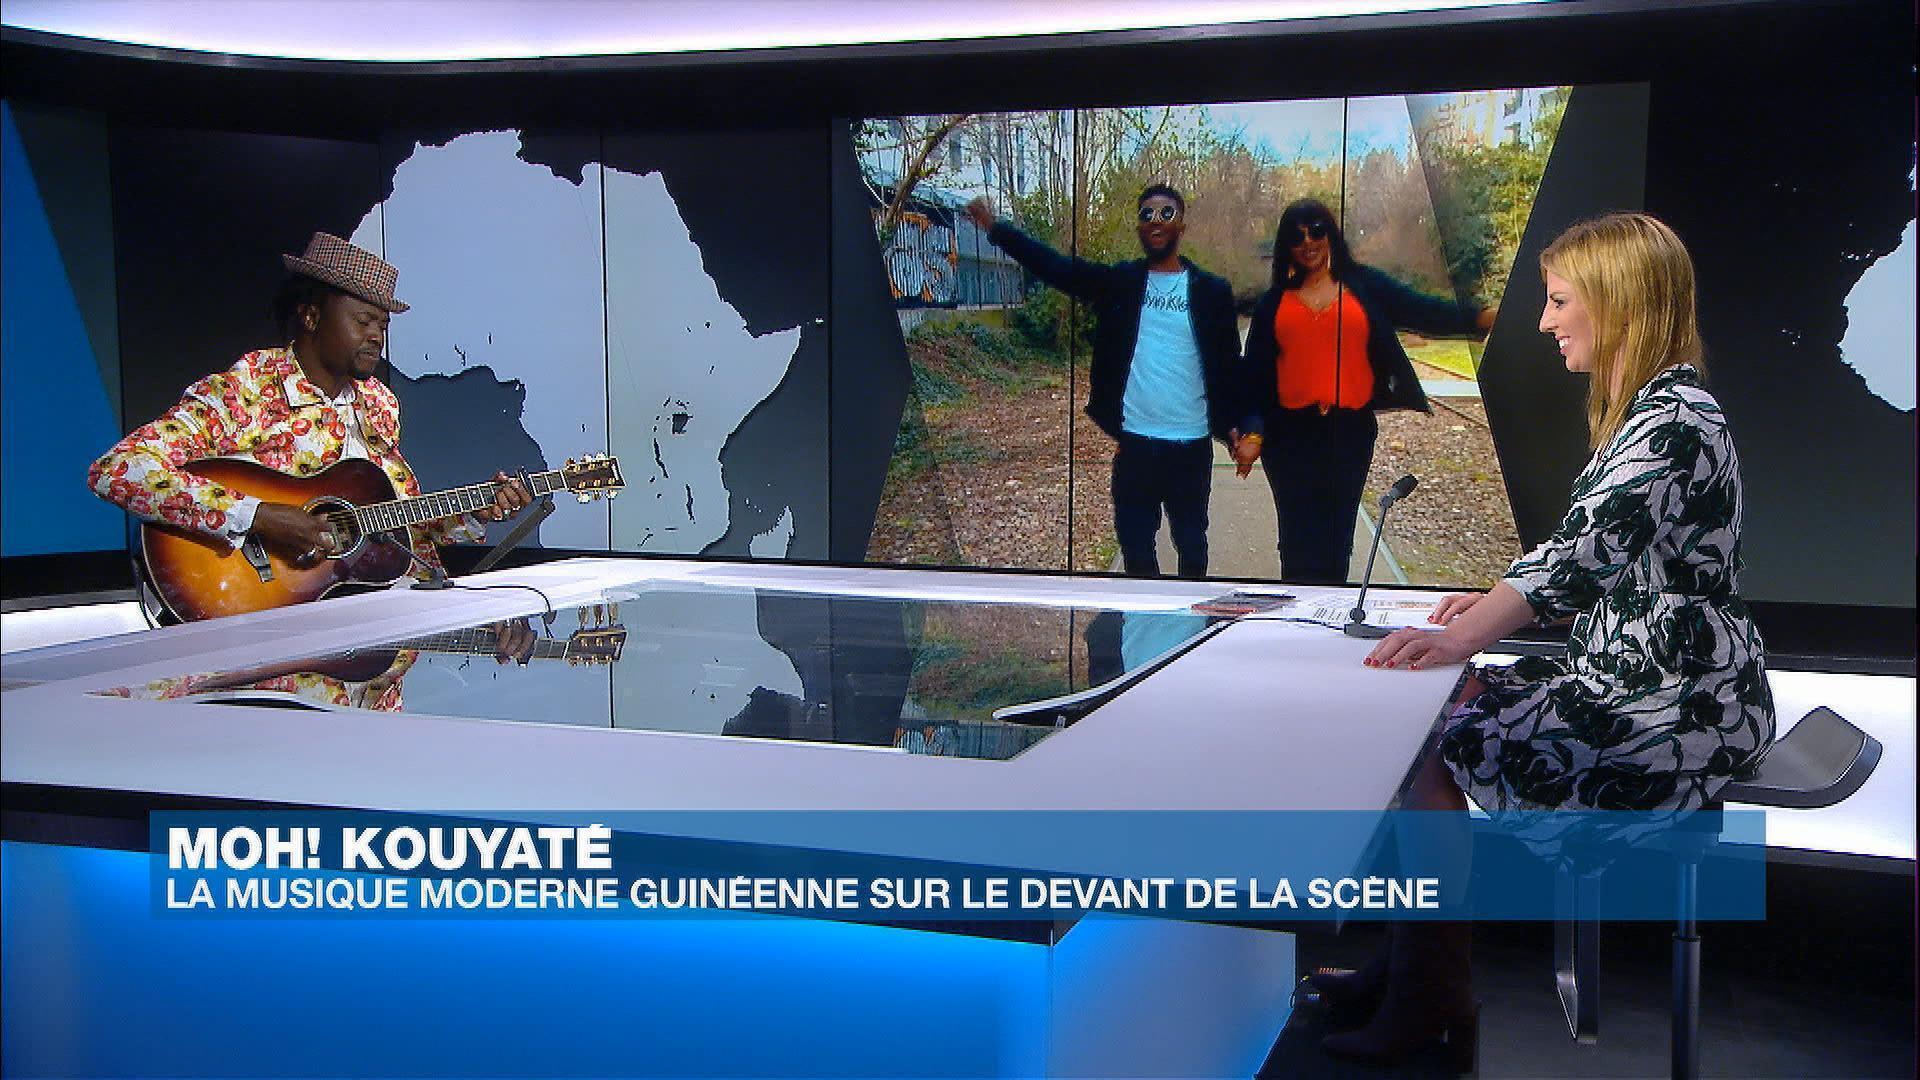 AFRIQUE HEBDO - Moh! Kouyaté